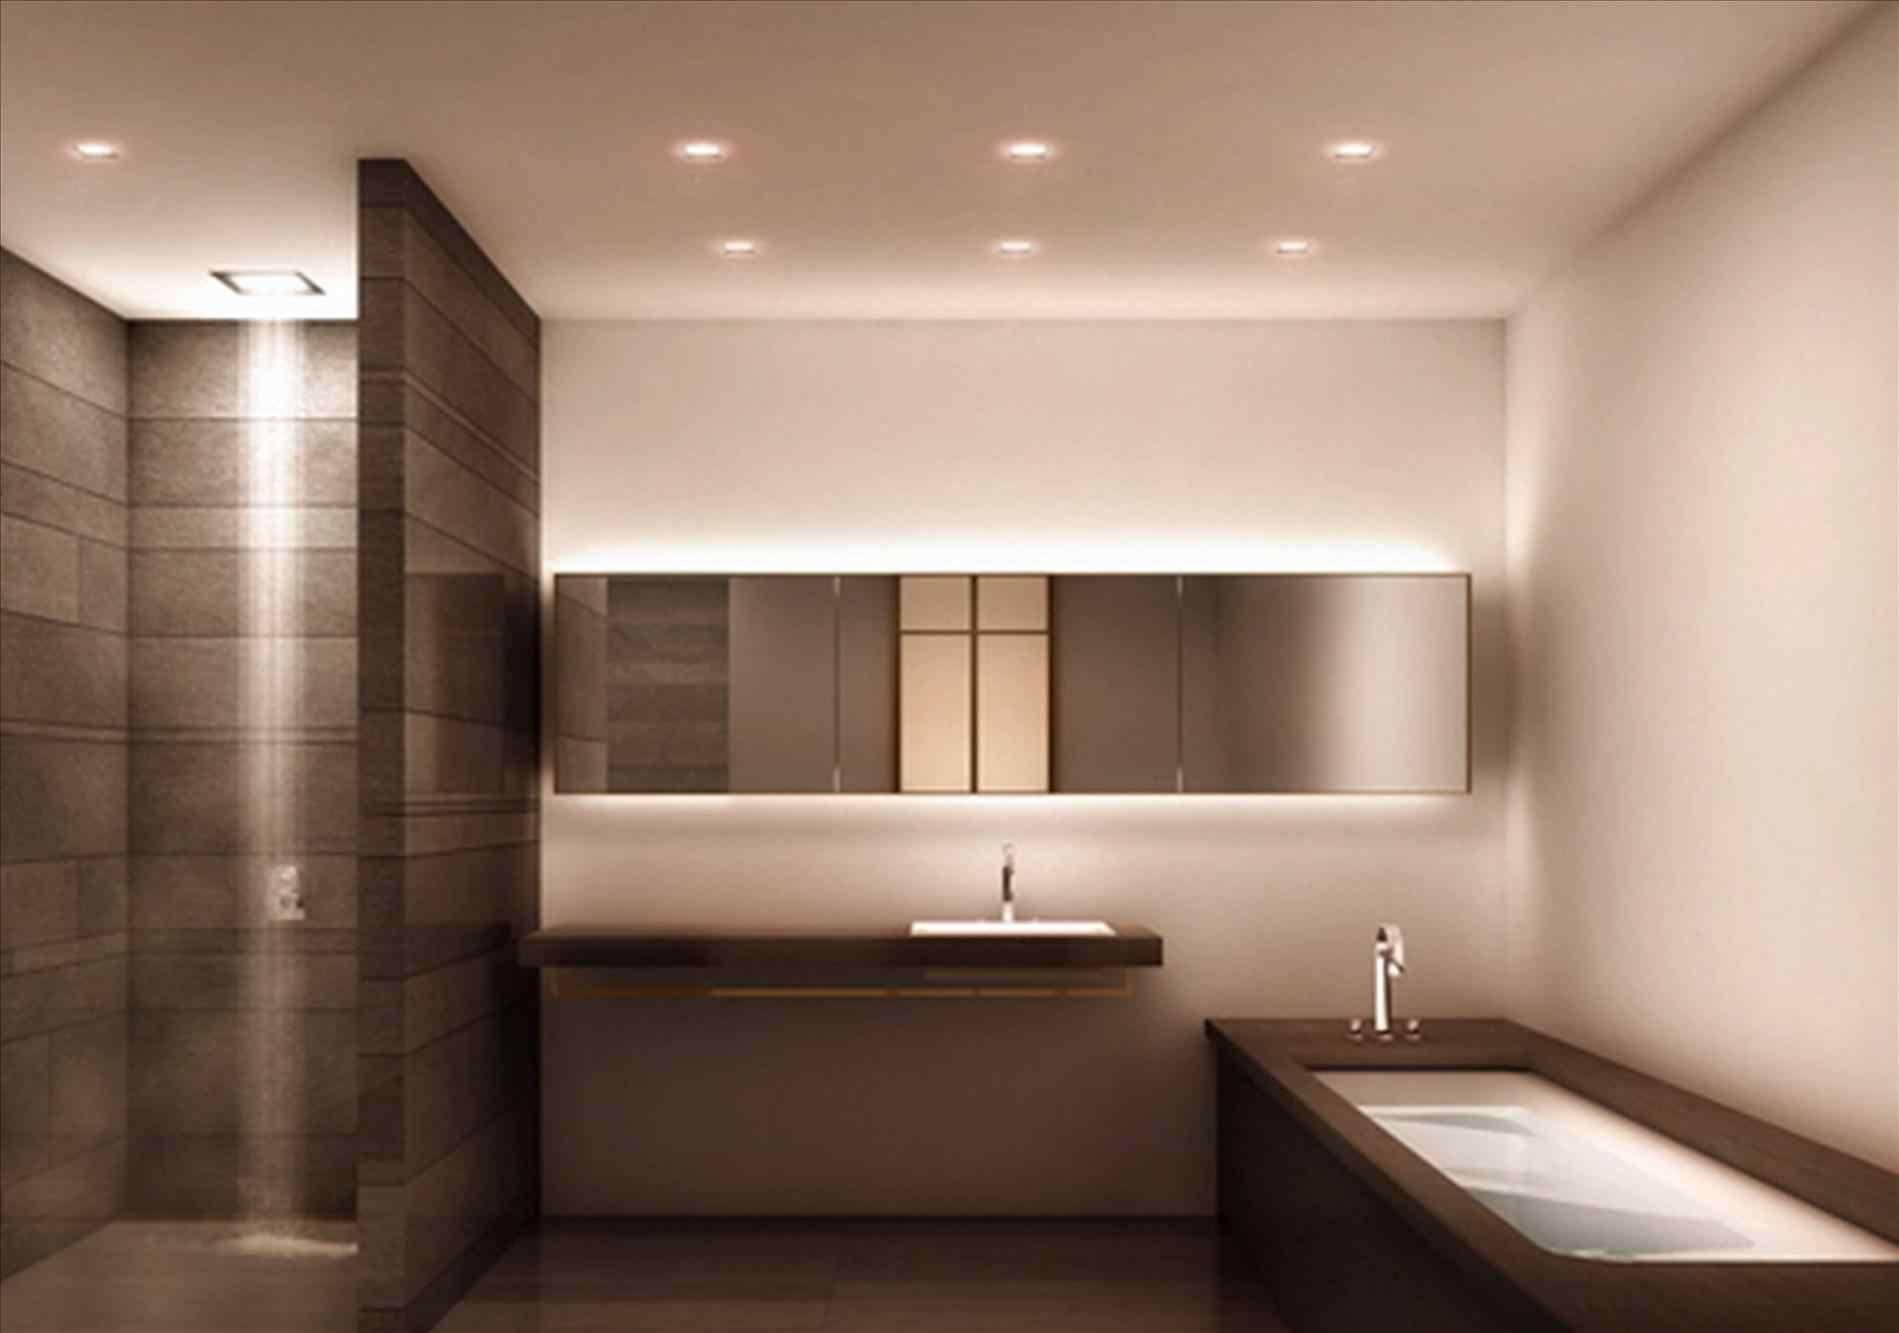 New Award Winning Bathroom Designs 2012 At Homelivings Awesome Bathroom Designs 2012 Design Inspiration